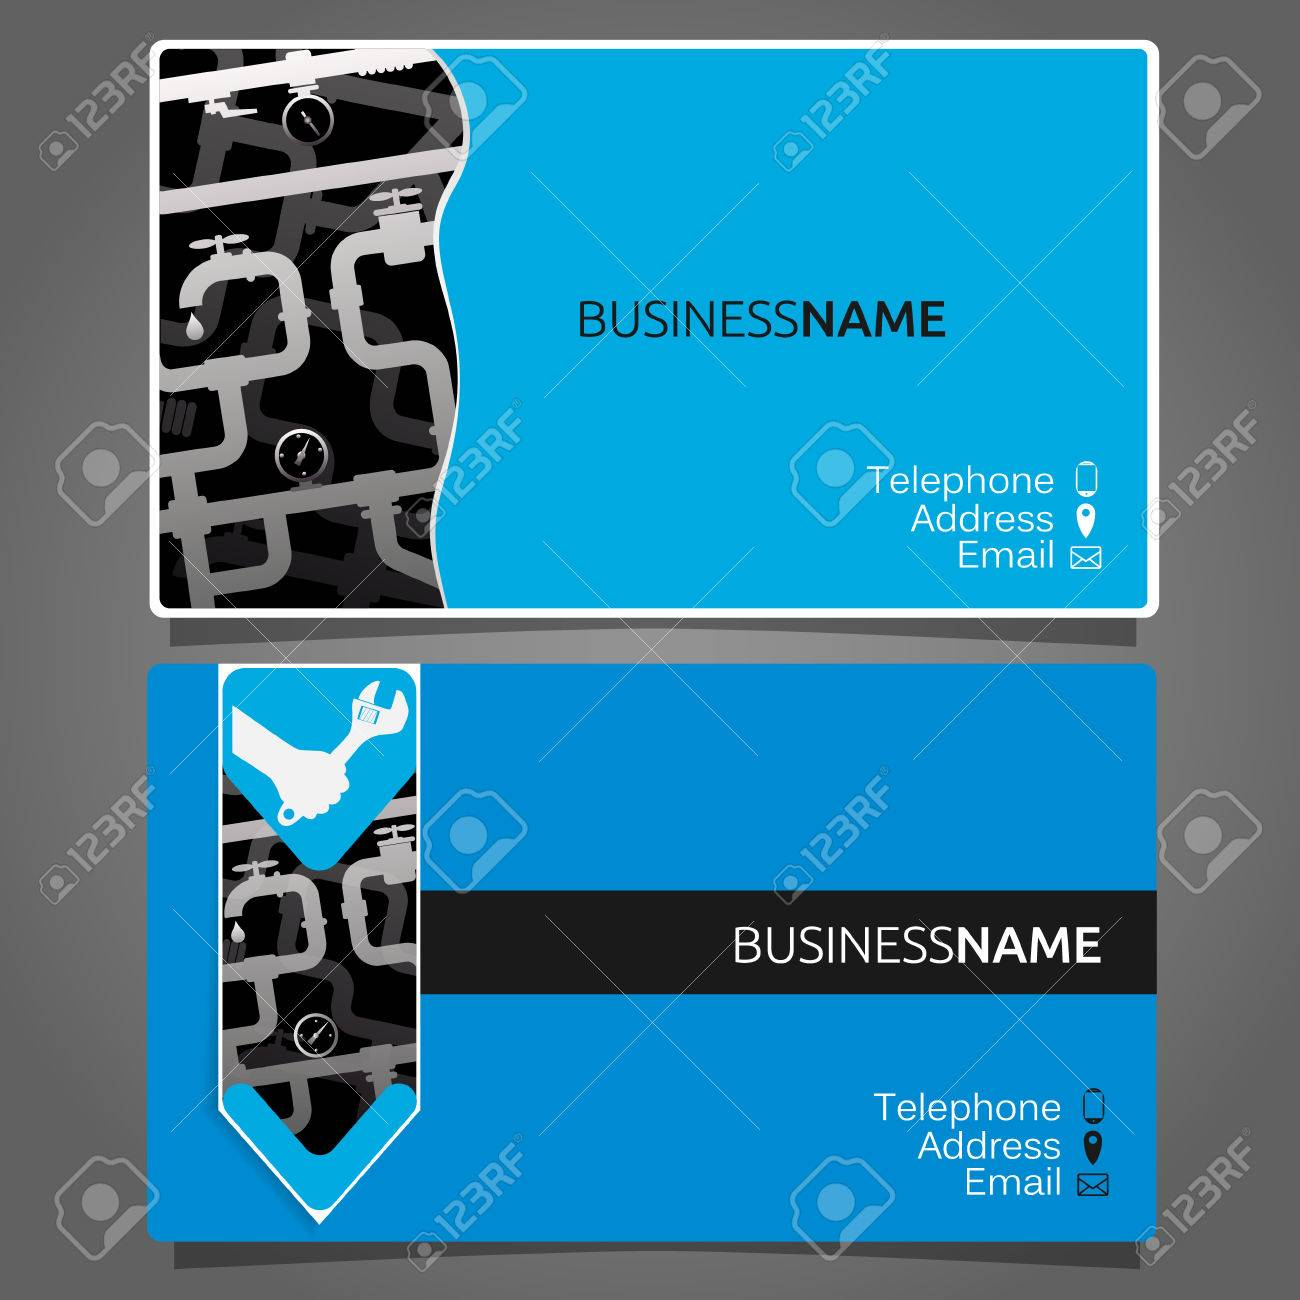 Business card for repair of plumbing and sanitary ware royalty free business card for repair of plumbing and sanitary ware stock vector 64053103 colourmoves